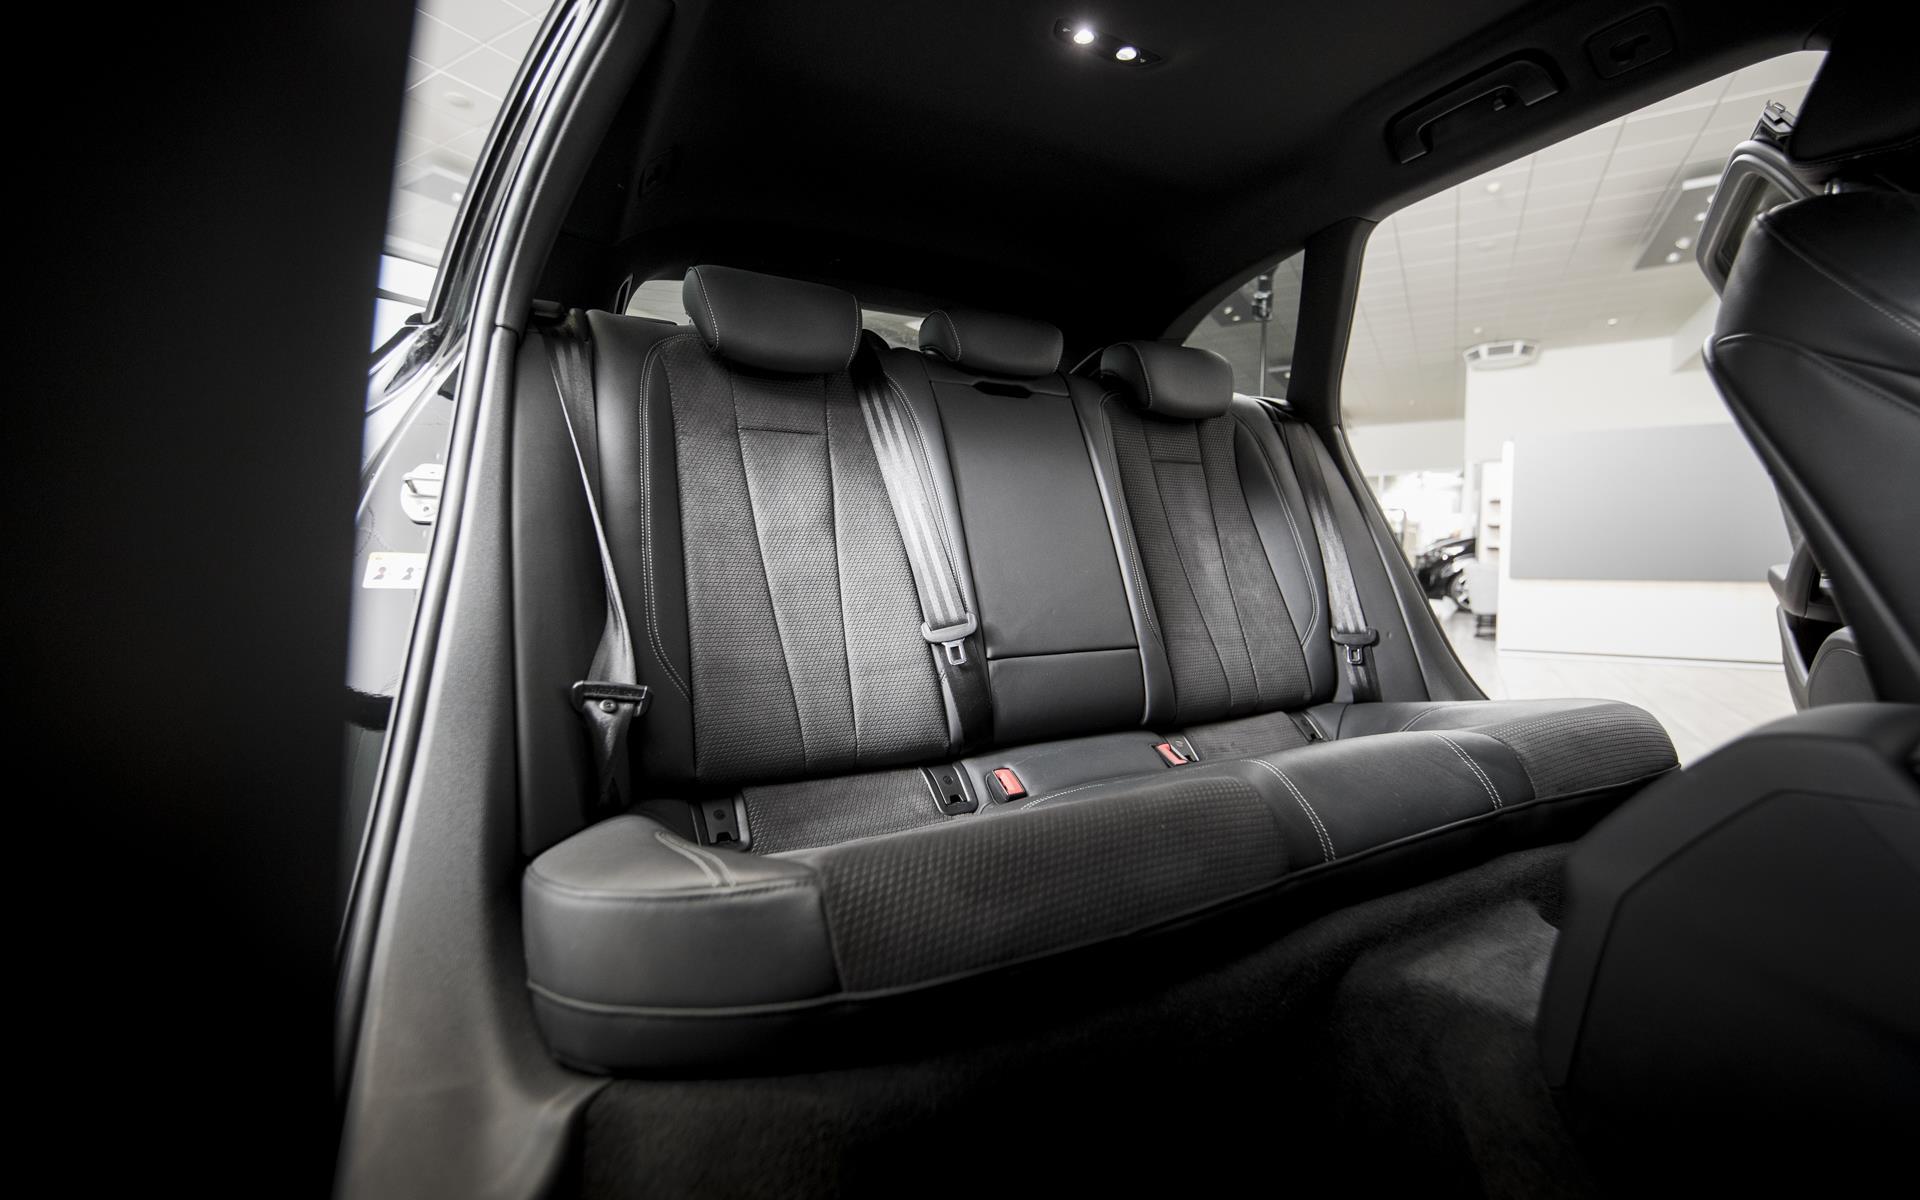 Avant 2,0 TDI S-Line Black Edition TipTronic 190HK Stc  image12